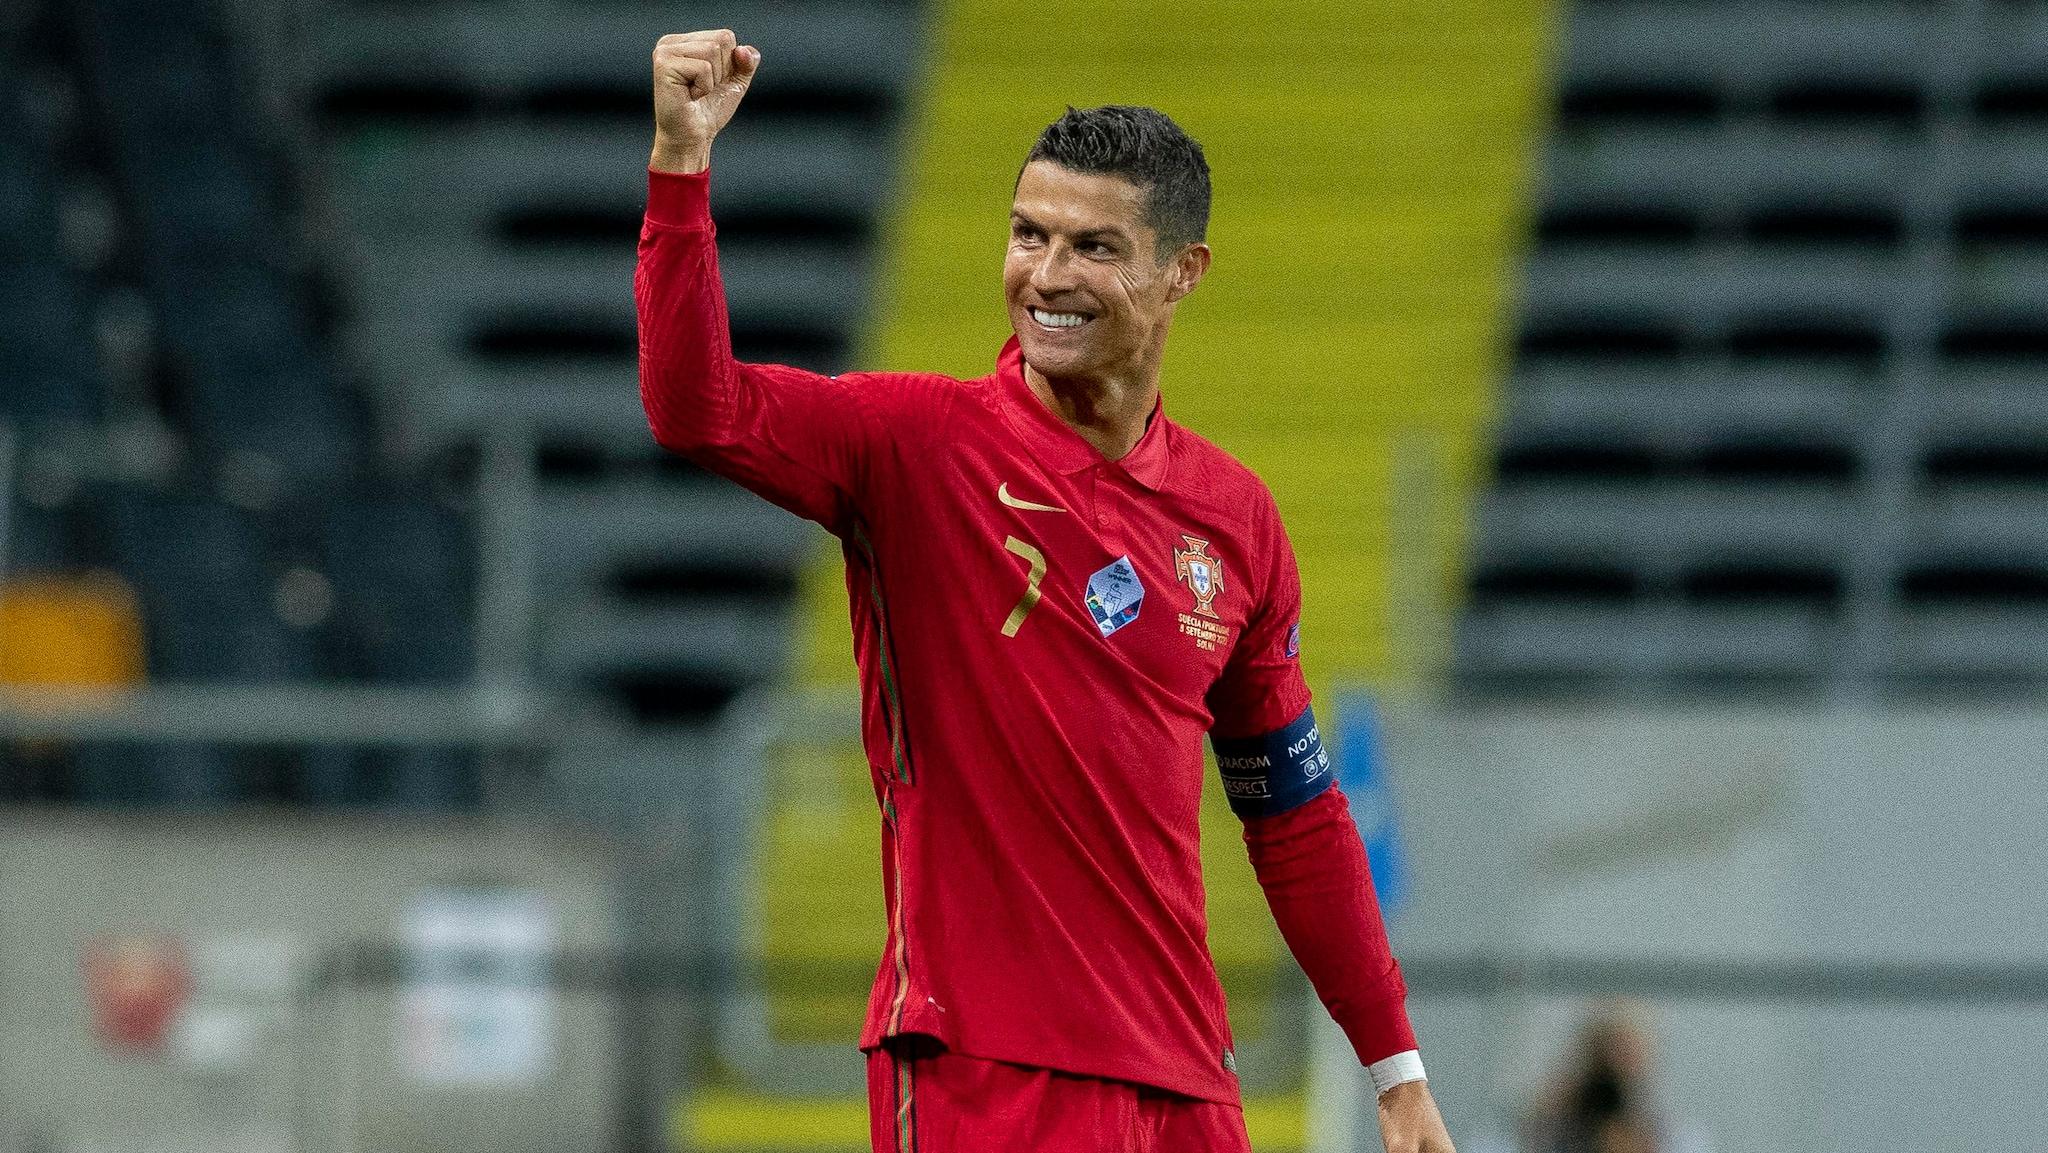 Sweden 0-2 Portugal: report